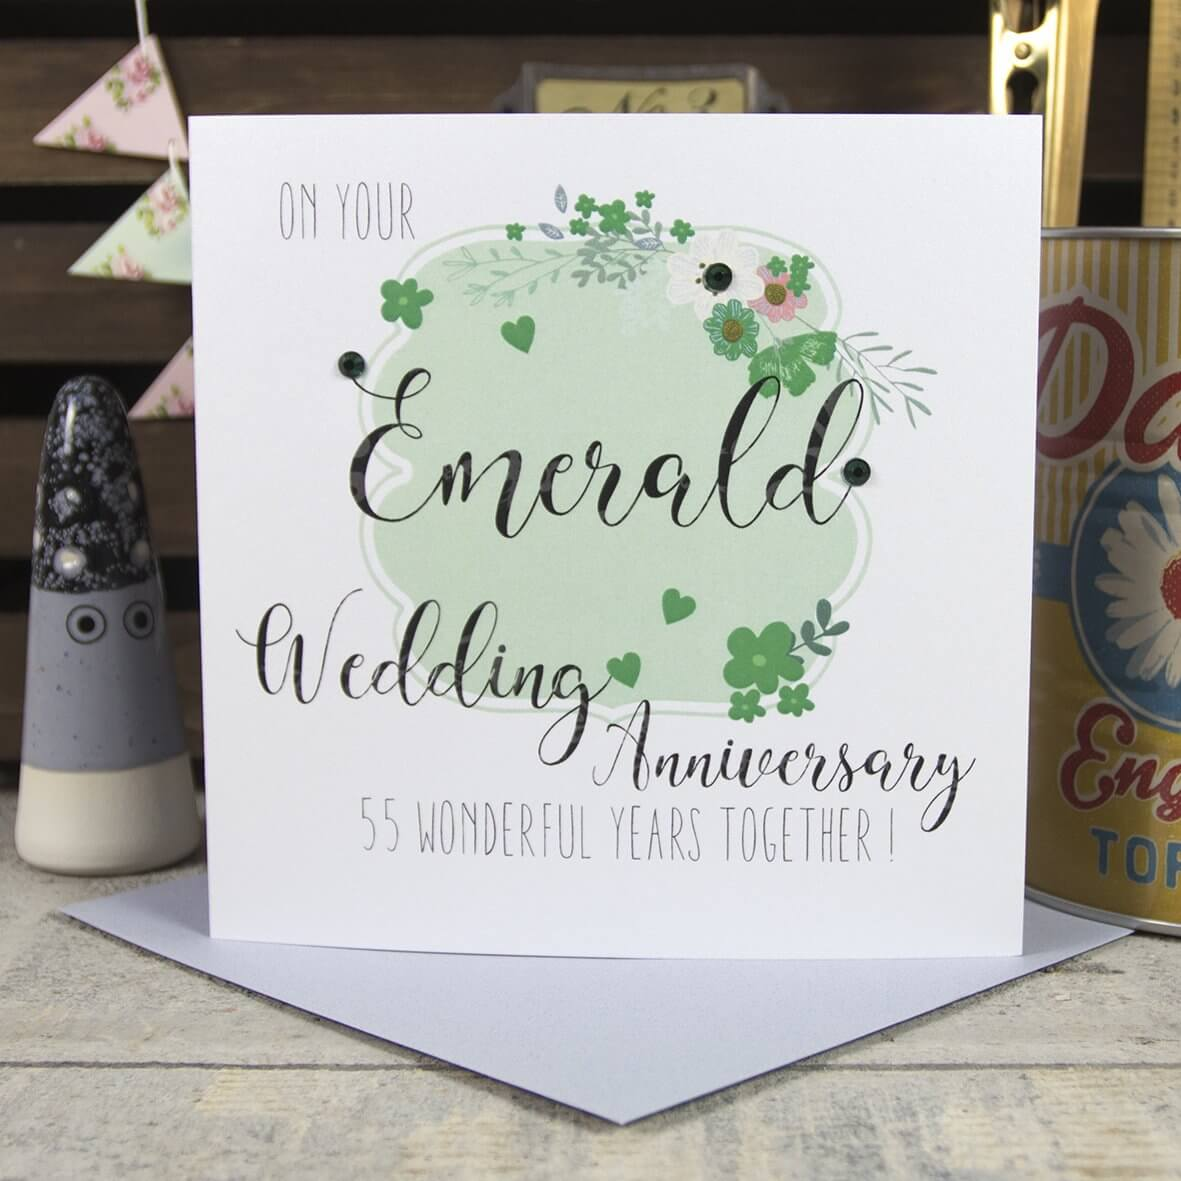 On your Emerald Wedding Anniversary 55 wonderful years together. Wedding Anniversary Card